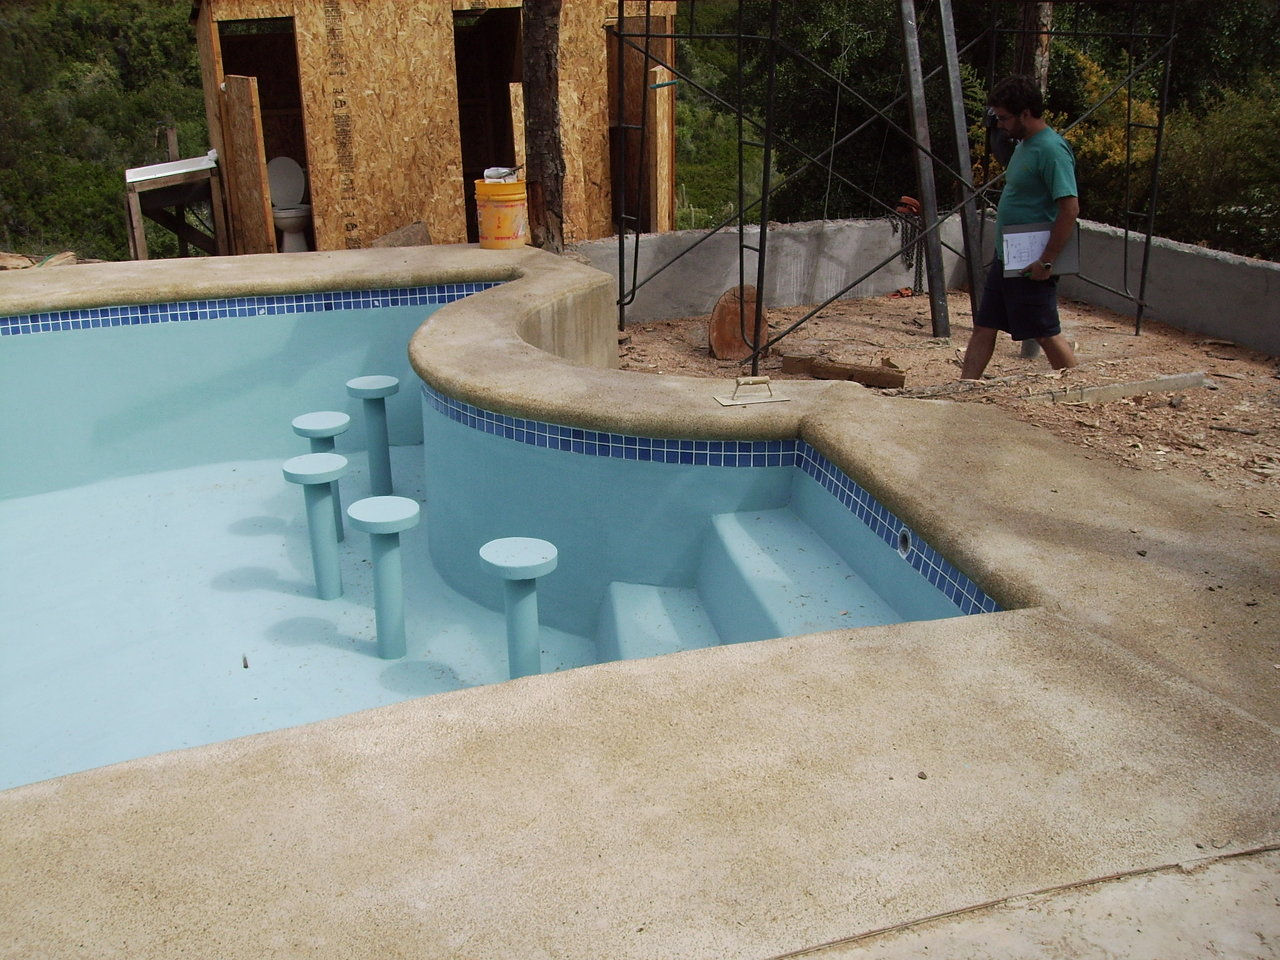 Taller 2 arquitectos ltda servicios integrales de for Pepa en la piscina